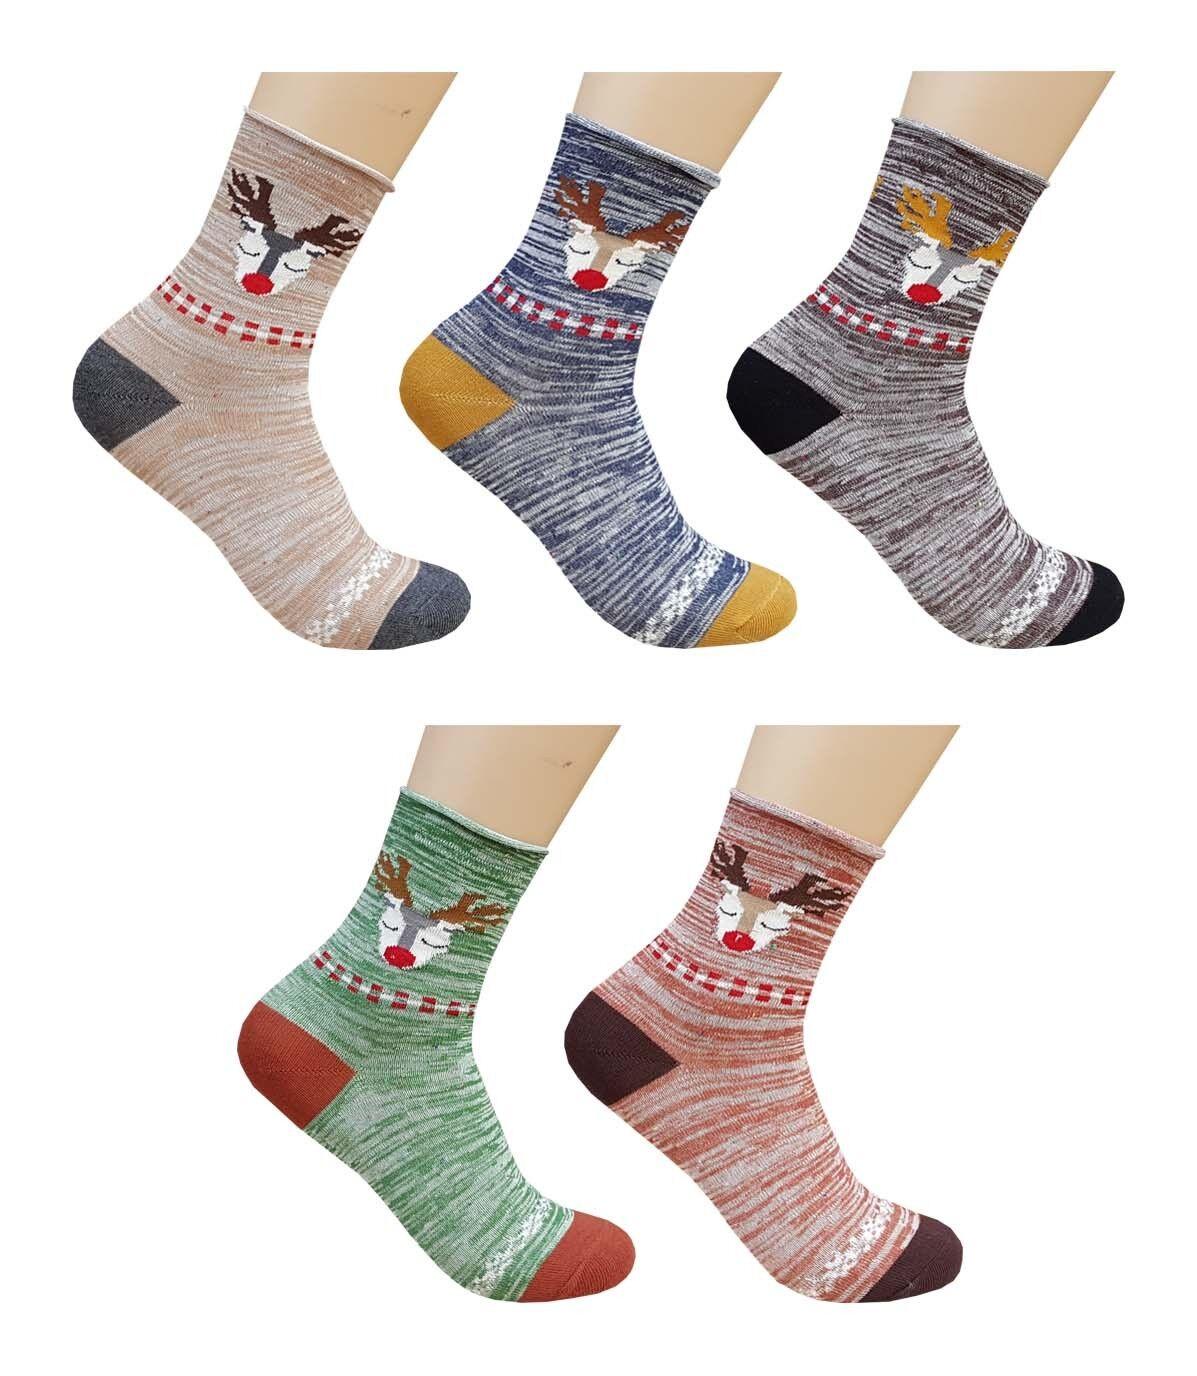 BLUE REEF Socken Damen Süß Rentier Spaß Neuheit Knöchel Socken 3-6